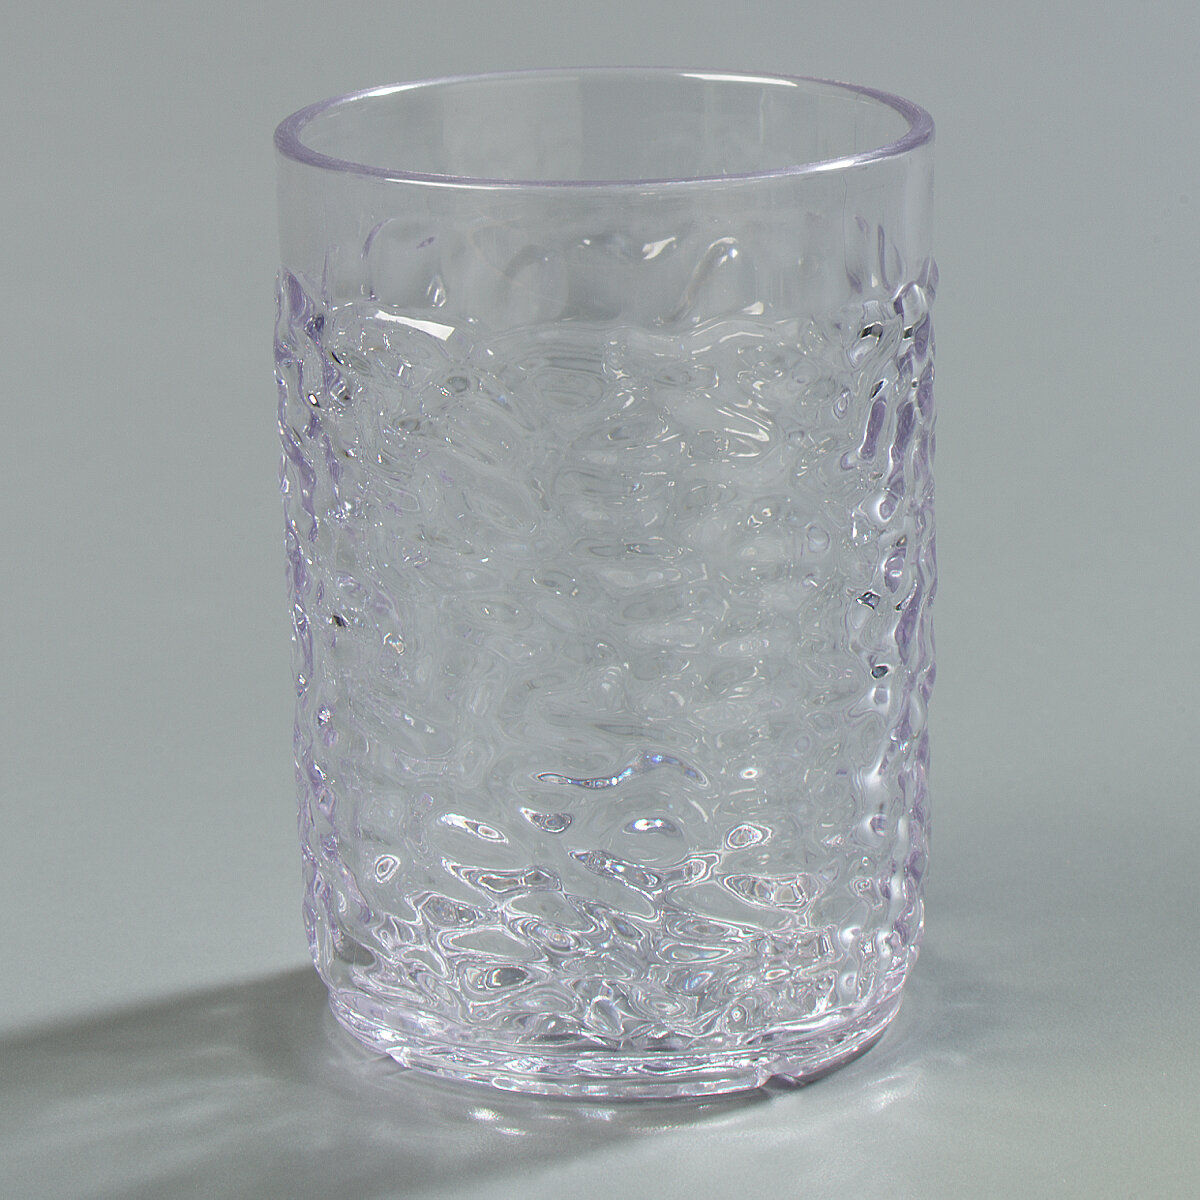 Carlisle Food Service Products Pebble Optic 5 Oz Plastic Drinking Glass Set Wayfair